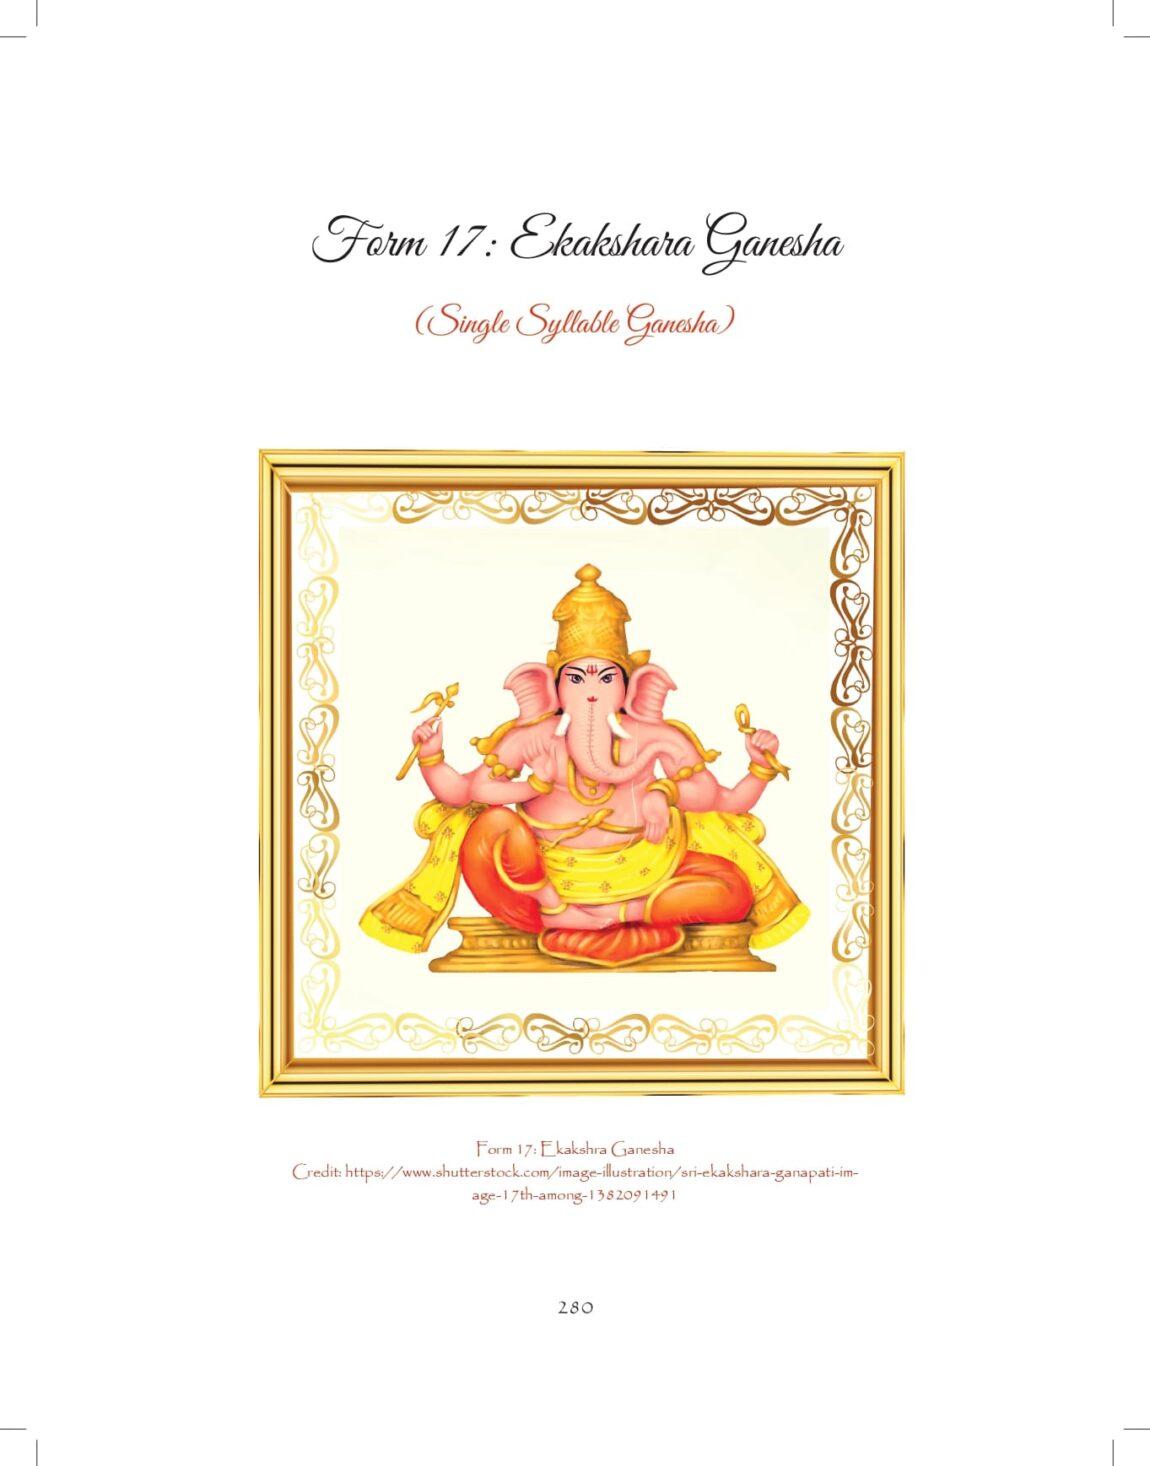 Ganesh-print_pages-to-jpg-0280.jpg